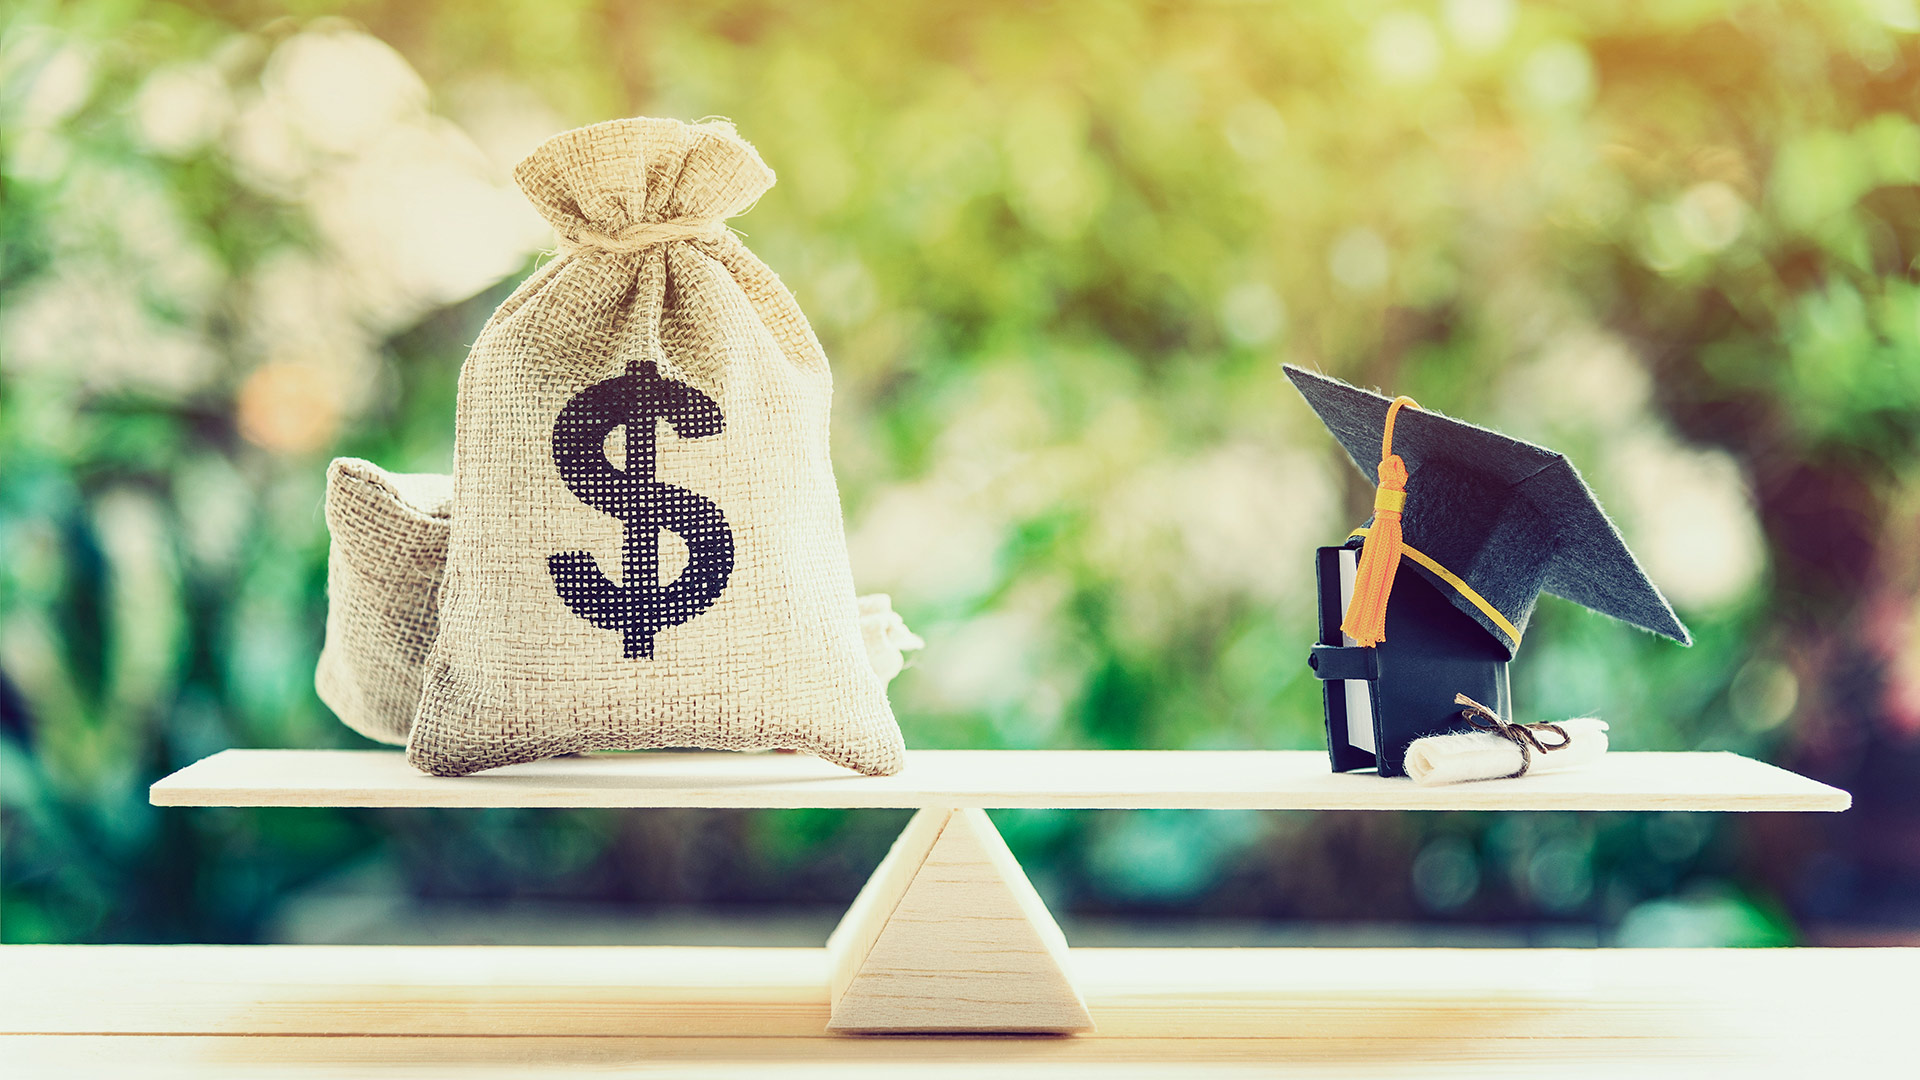 Should the U.S. cancel student debt? UHCL economics prof weighs in